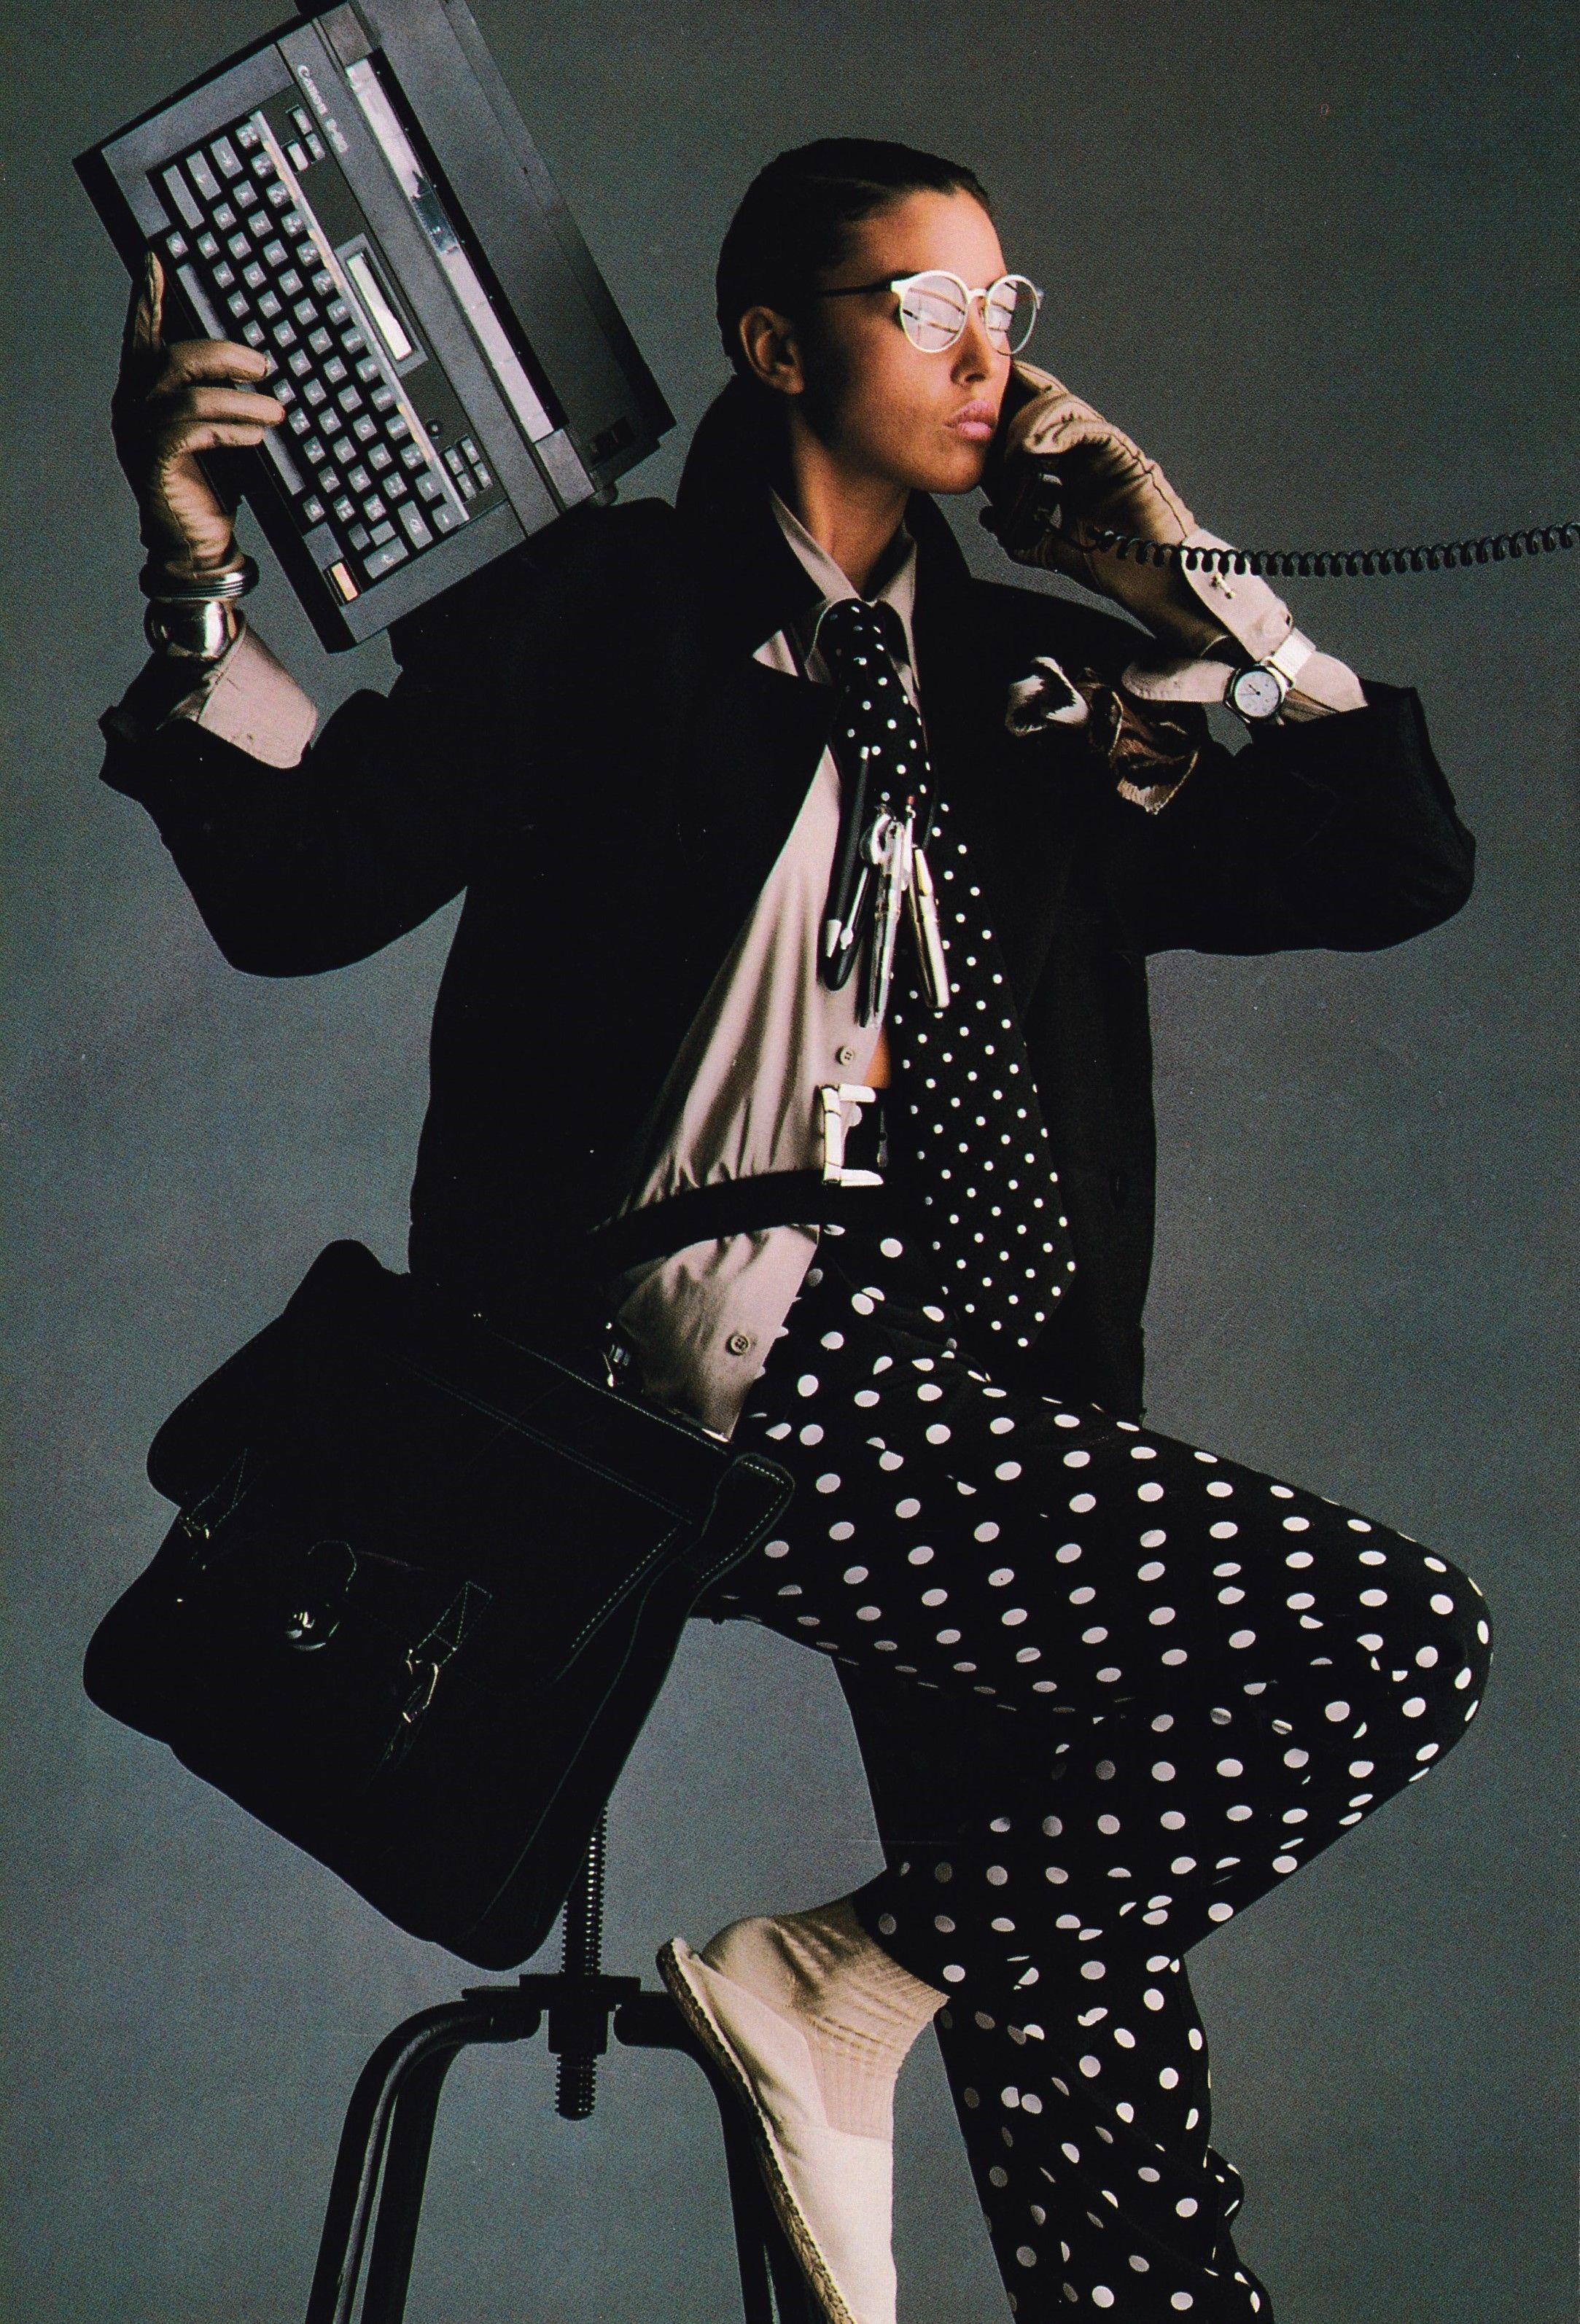 1988 US Elle July  ''Go Dotty''.Photographers- Steven Silverstein & Gilles Bensimon. Model  Monica Bellucci ,